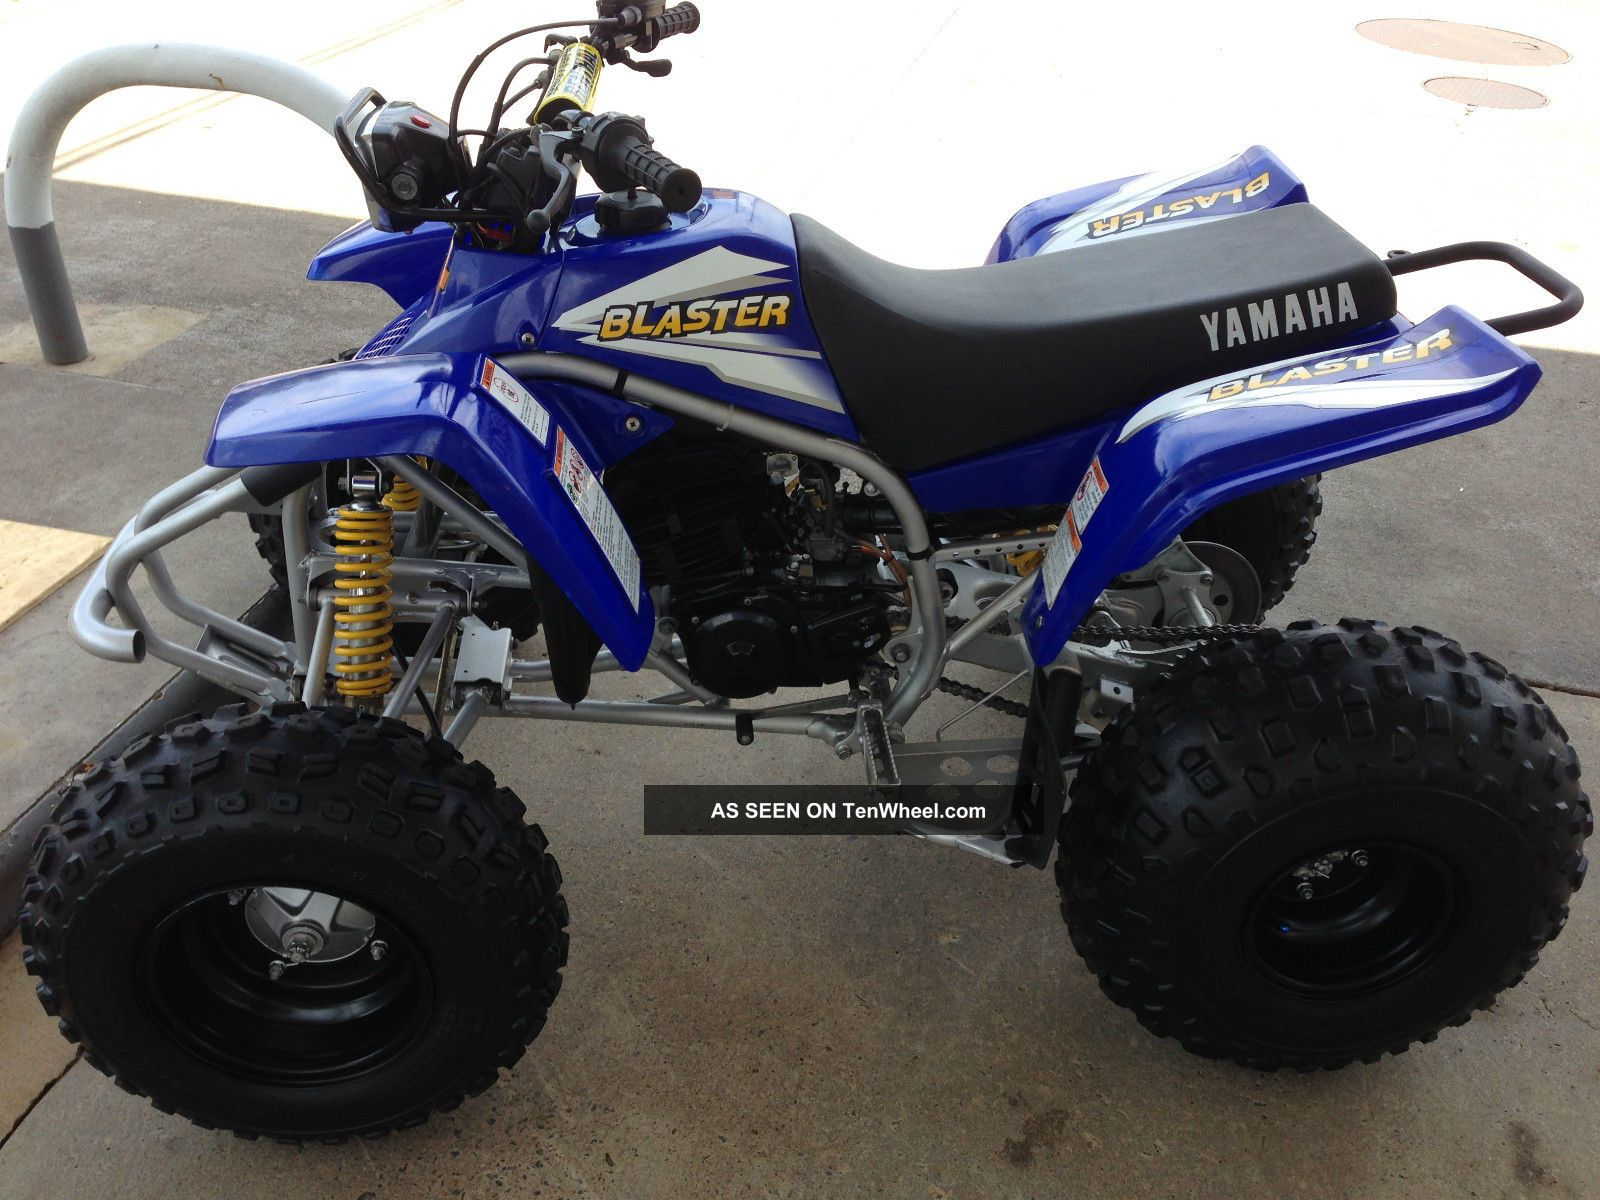 Yamaha Blaster Horsepower